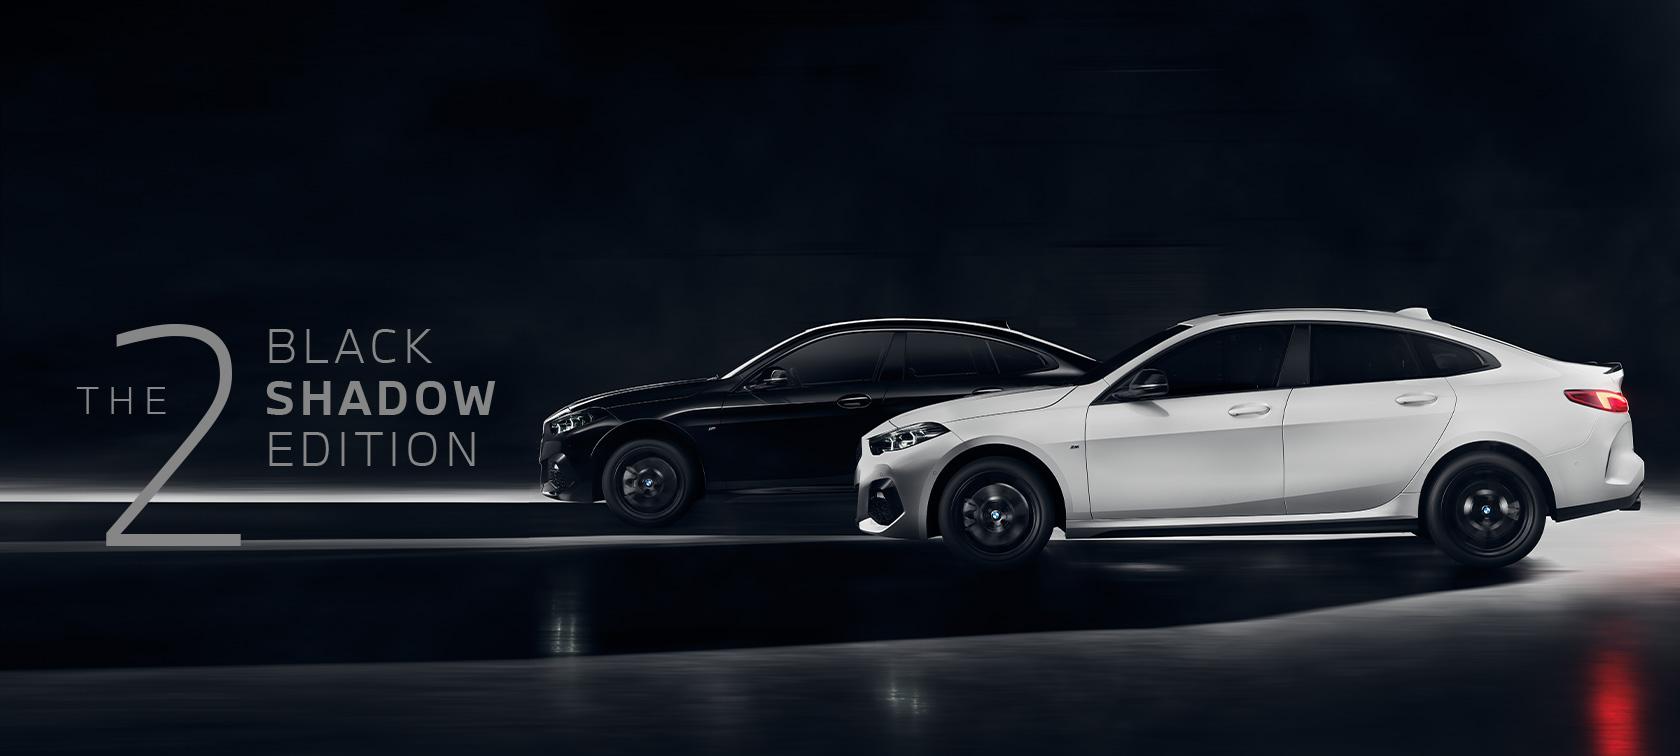 BMW 2 SERIES Black Shadow Edition